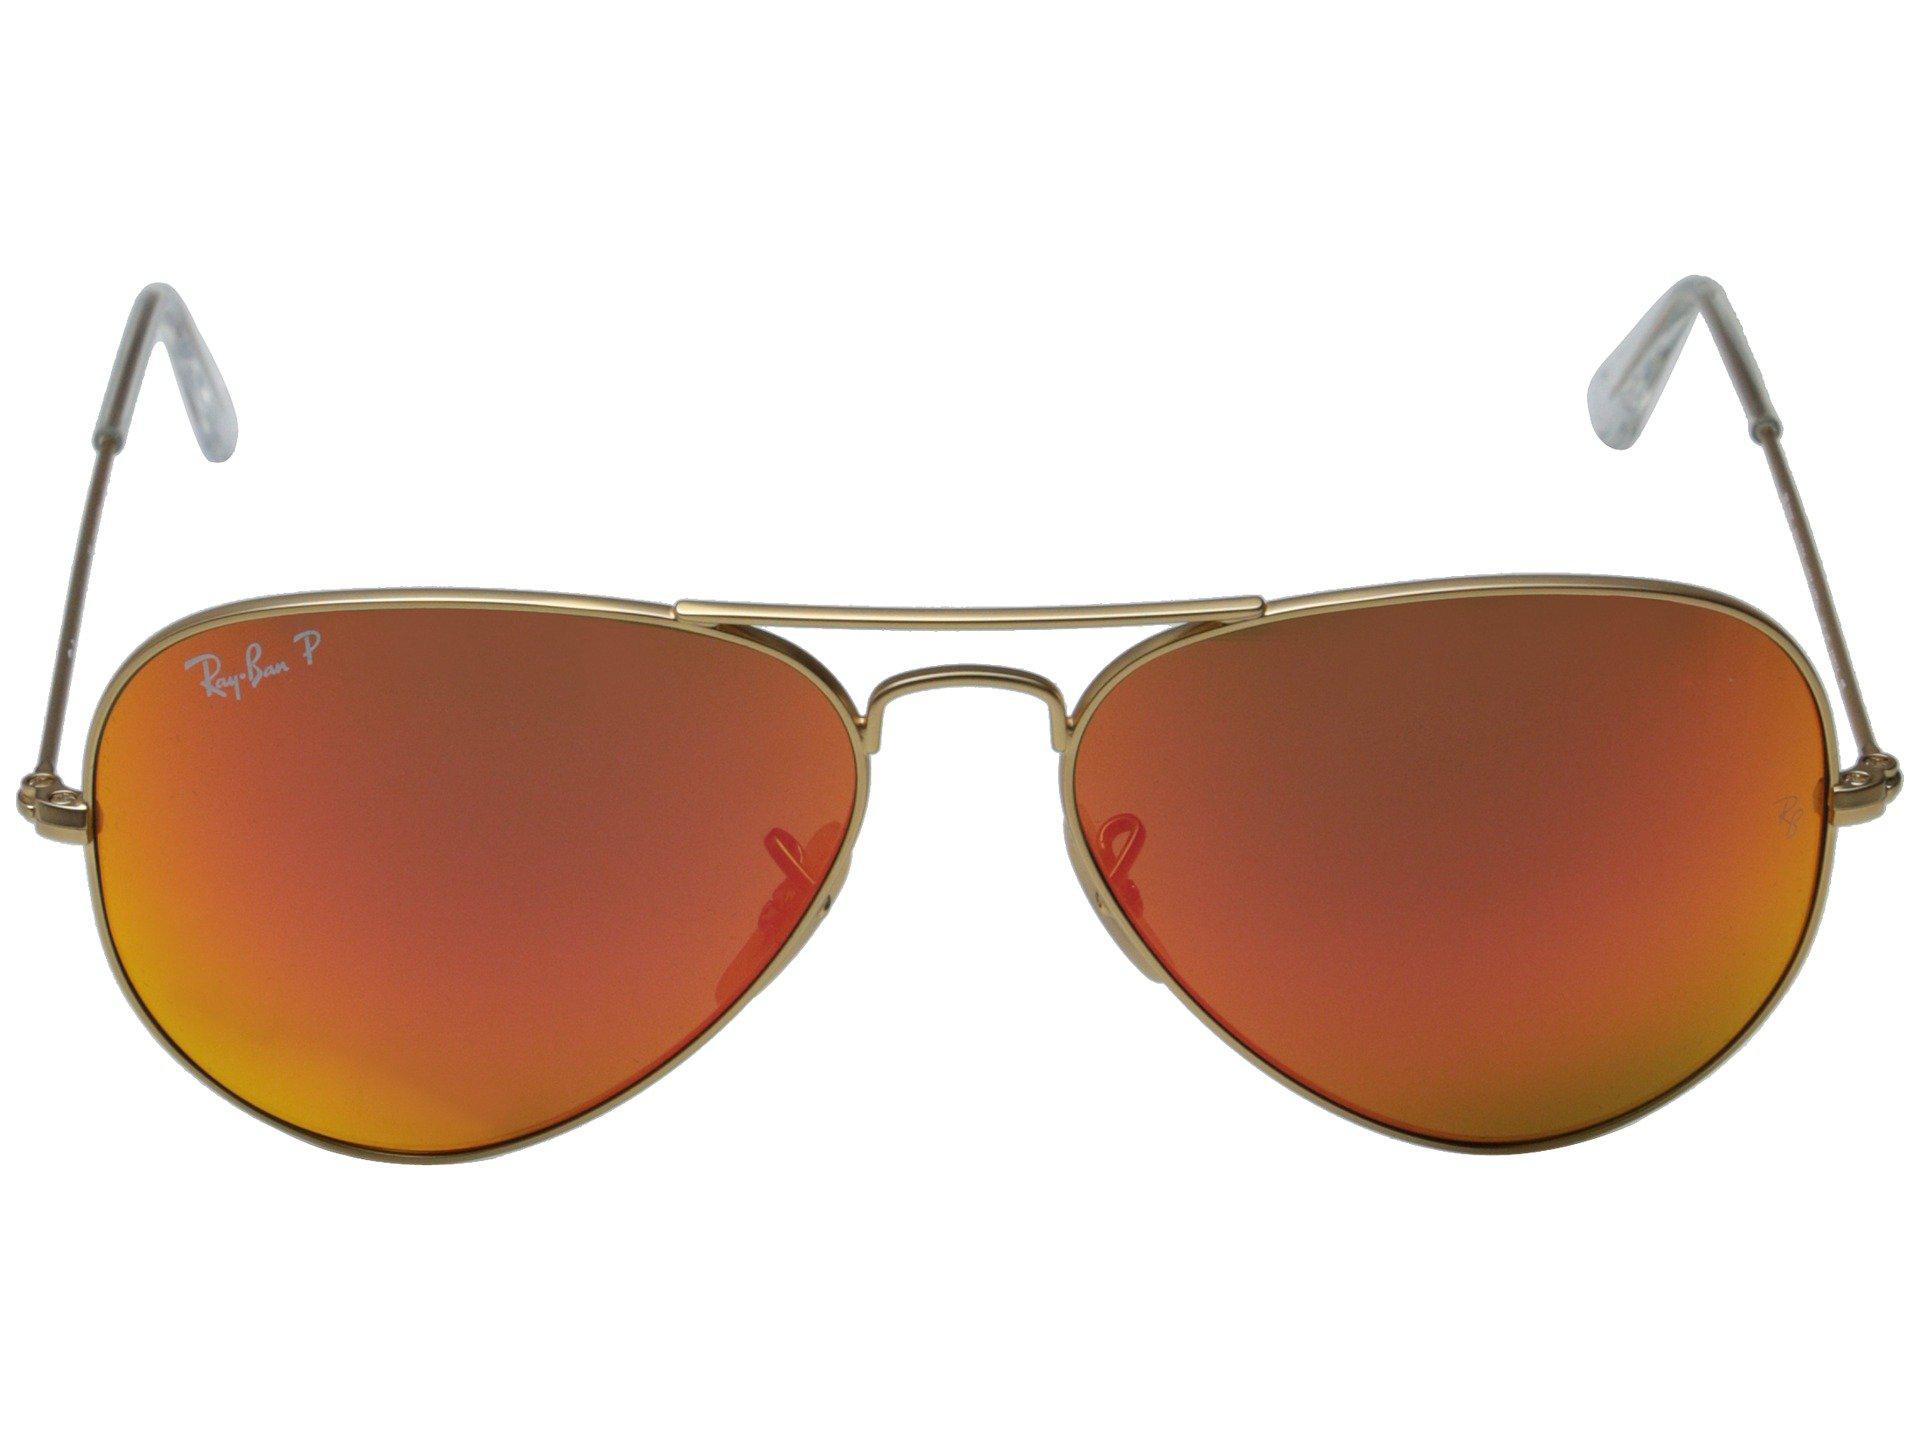 bba03f62825d Ray-Ban - Gray Rb3025 Aviator Polarized Flash Lenses 58mm (matte Gold orange.  View fullscreen